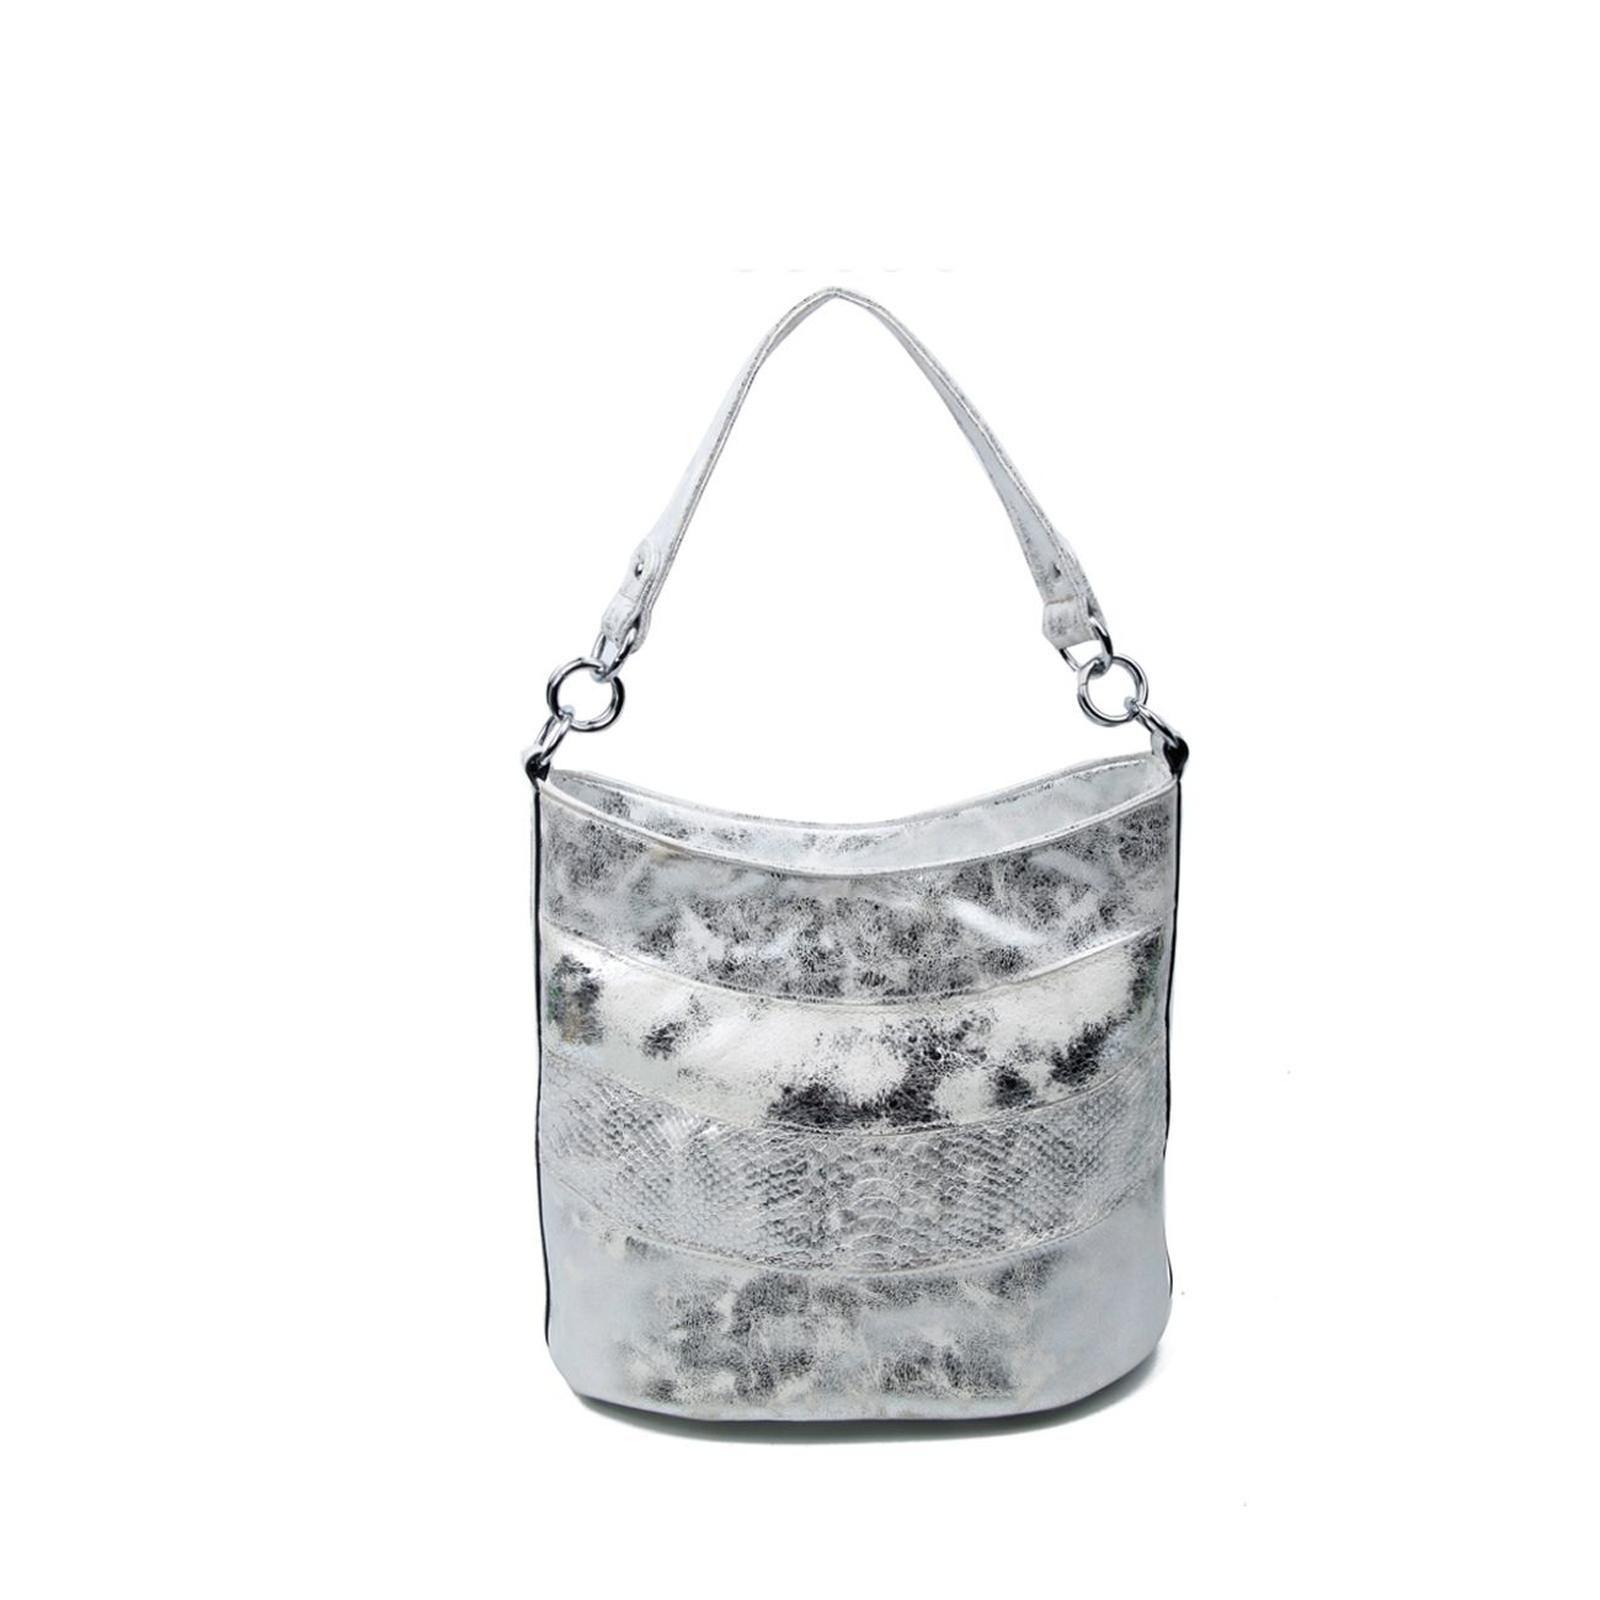 OBC BOLSO DE MUJER SHOPPER METALIZADO bolso de mano bolso bandolera bolso bandolera bolso bandolera bolso hobo bolso plata